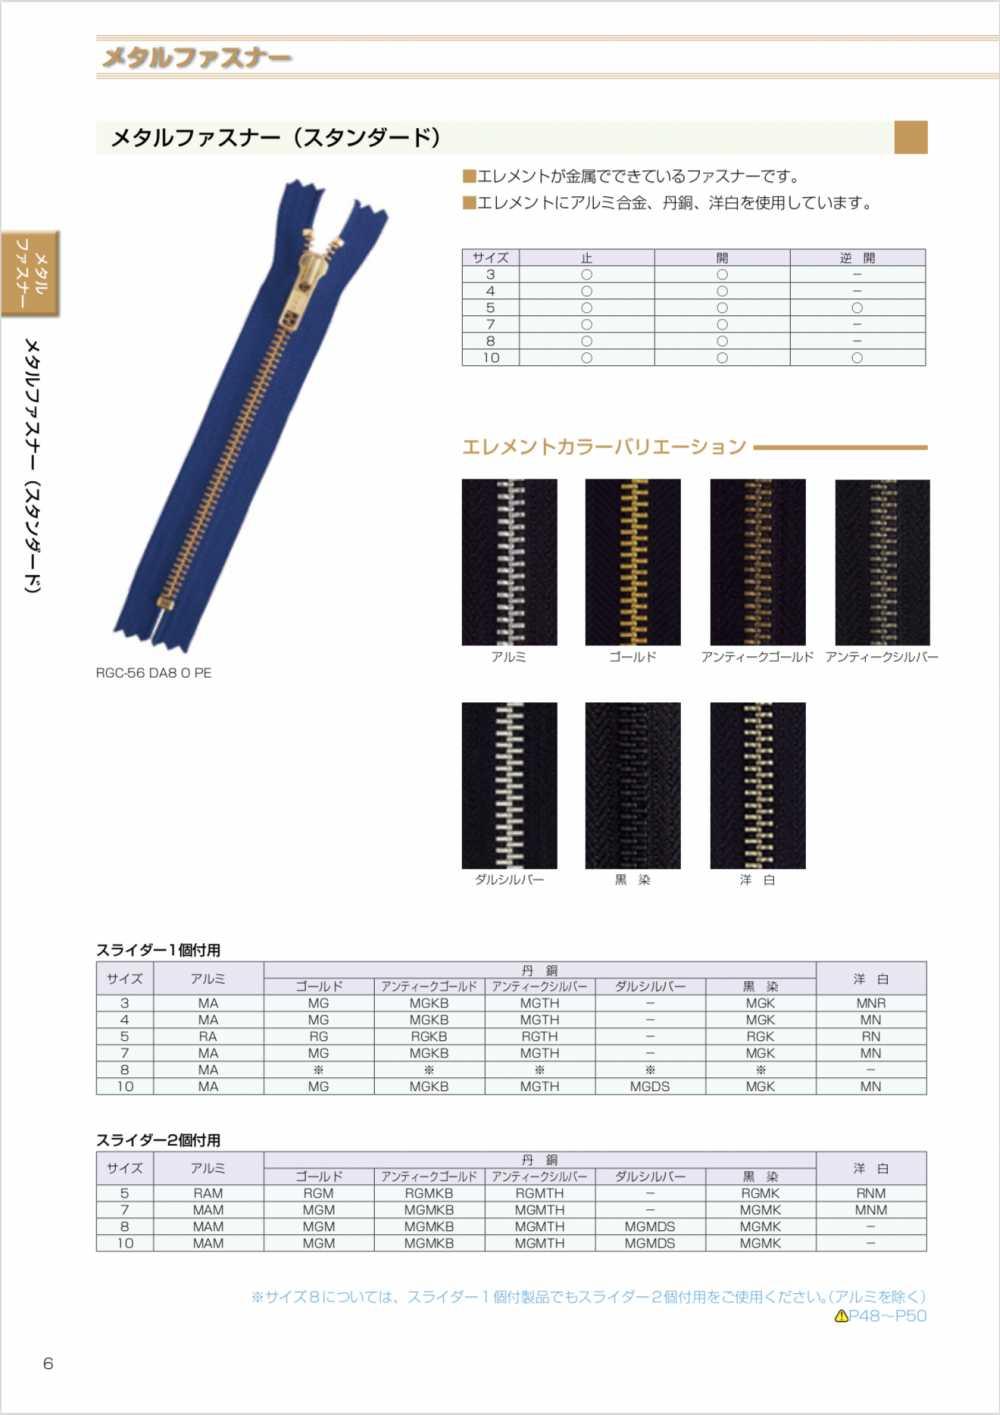 10MGKOR YKKメタルファスナー 10サイズ 黒染 オープン YKK/オークラ商事 - ApparelX アパレル資材卸通販